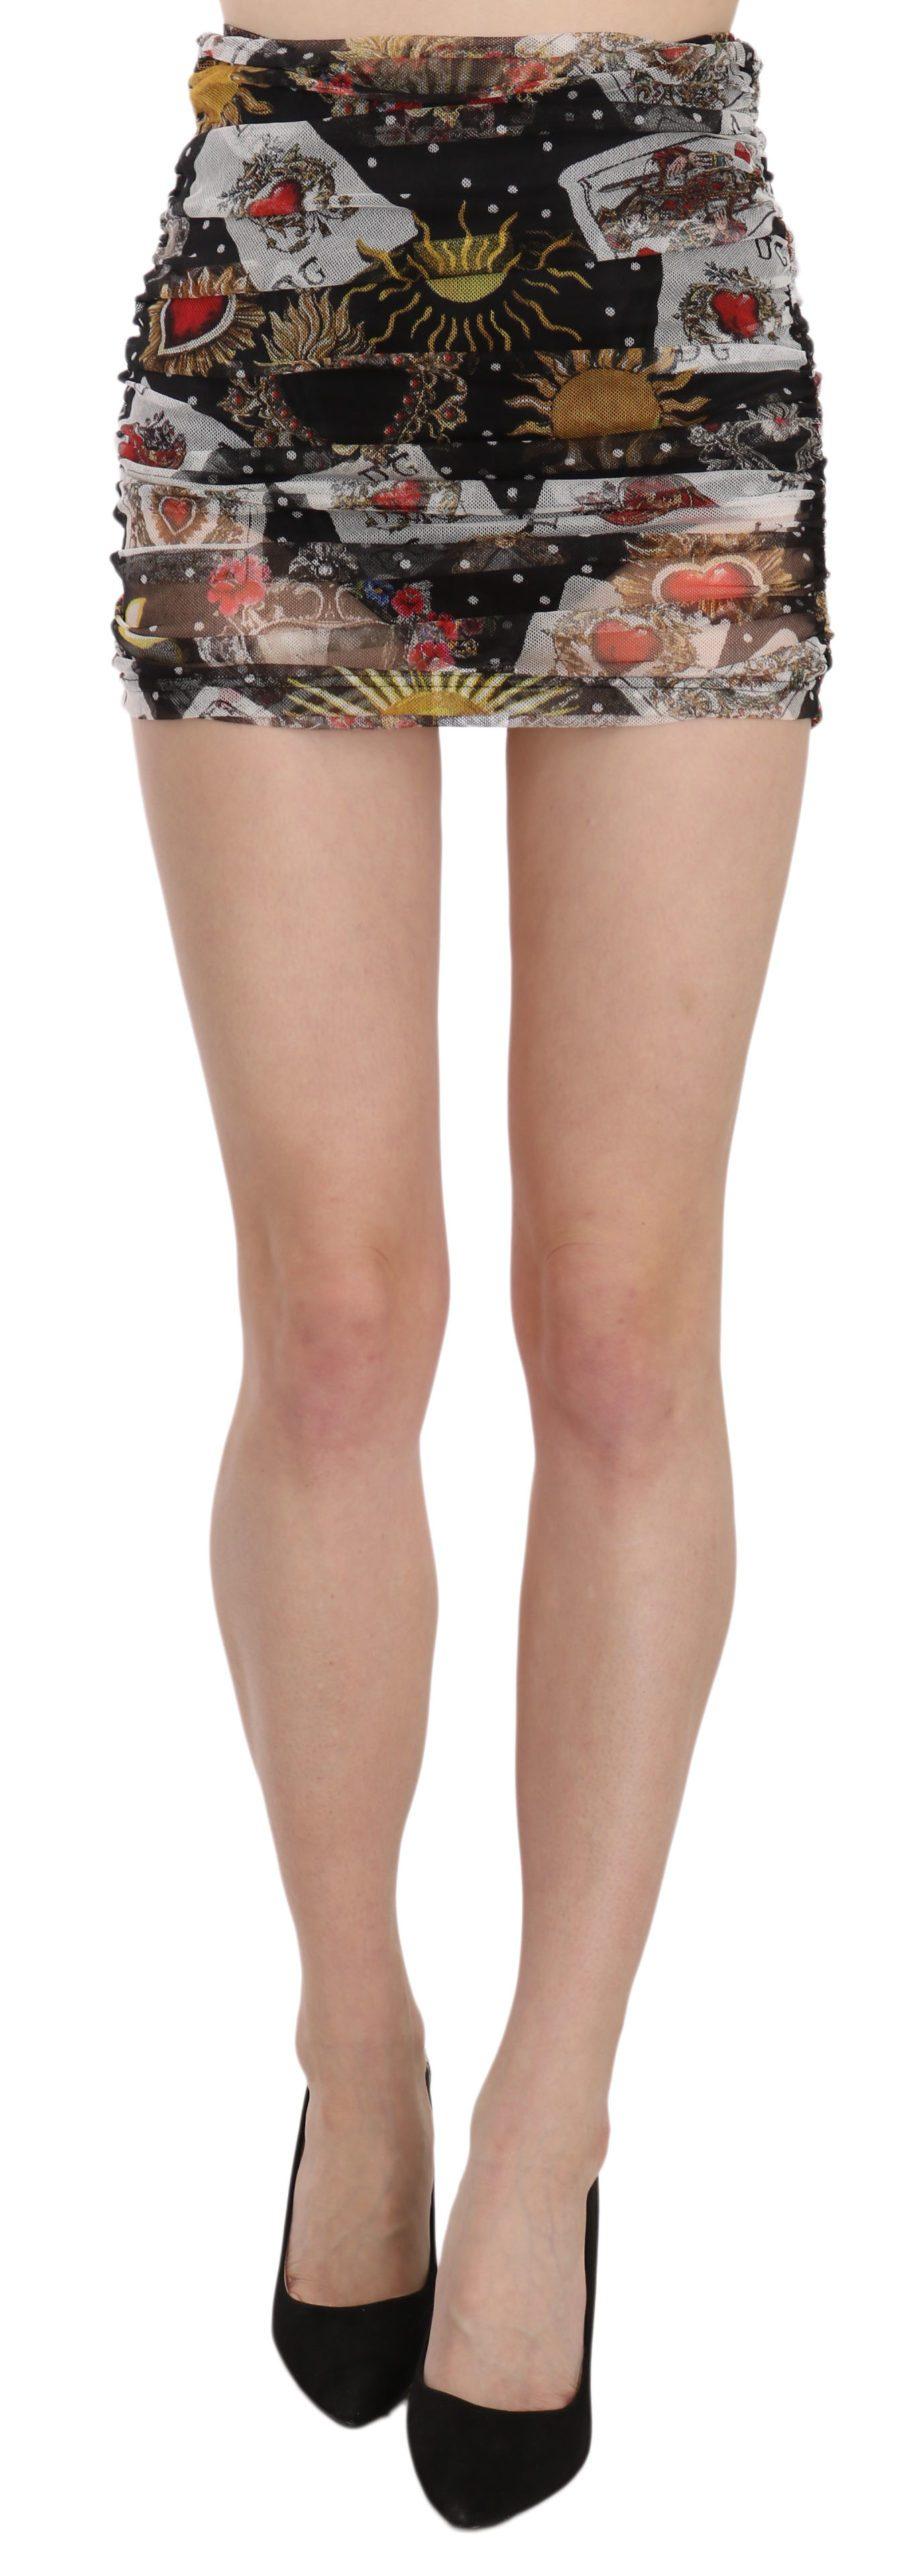 Dolce & Gabbana Women's Deck Of Cards Micro Skirt Black SKI1328 - IT40|S